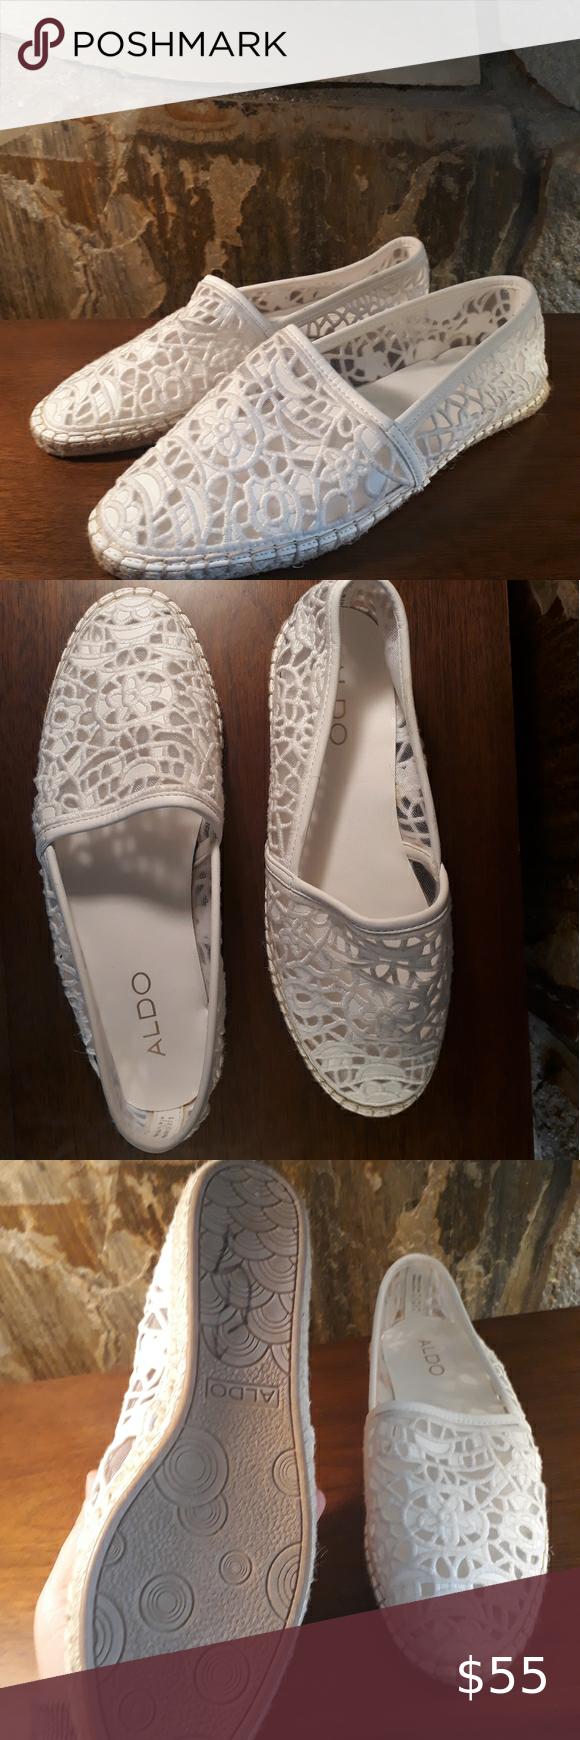 Aldo White Espadrilles Flats Shoe 7.5